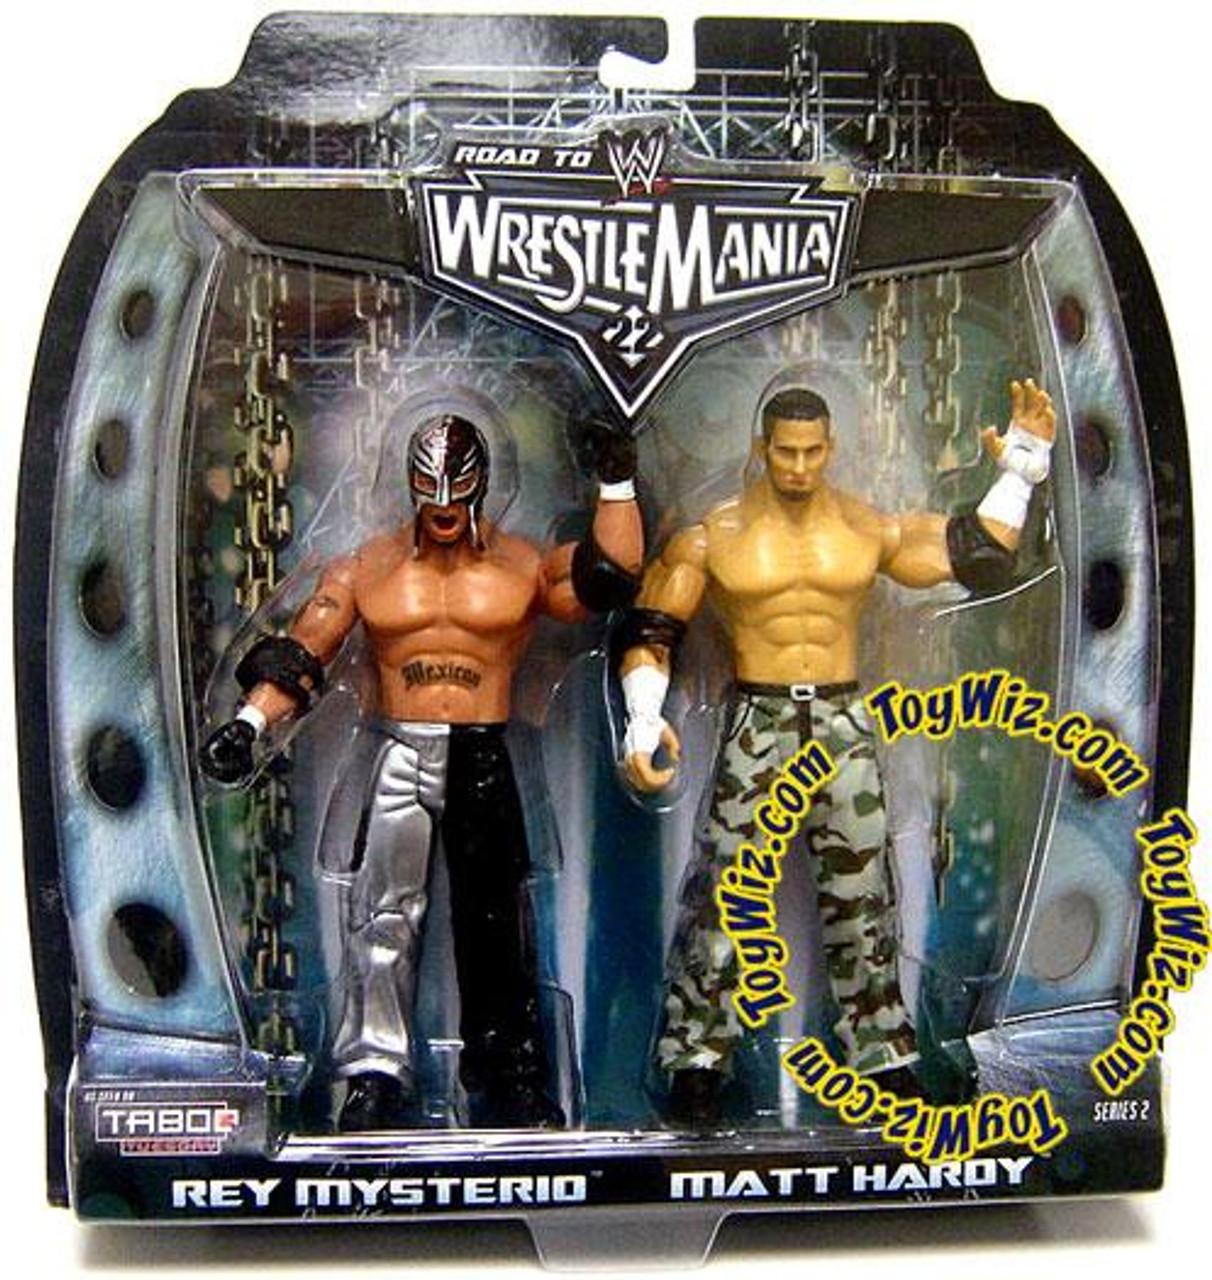 WWE Wrestling Road to WrestleMania 22 Series 2 Rey Mysterio & Matt Hardy Action Figure 2-Pack